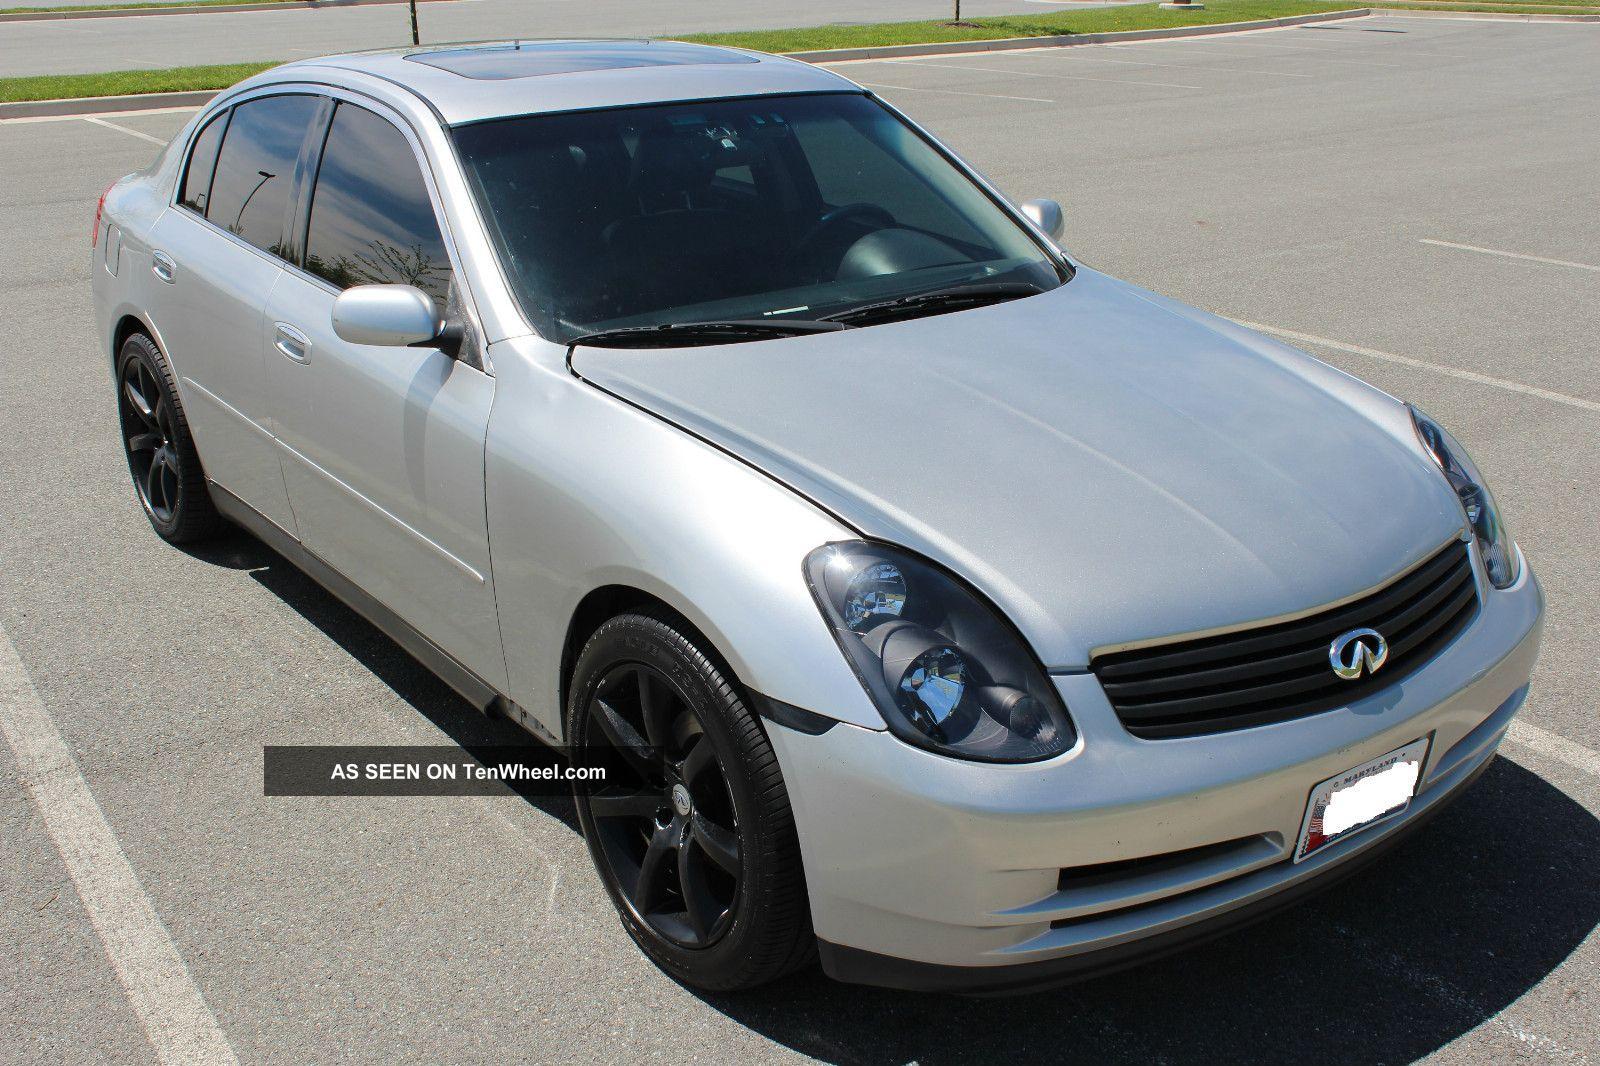 All Types infinity g35 2003 : 2003 Infiniti G35 Base Sedan 4 - Door 3. 5l Coupe Wheels, &